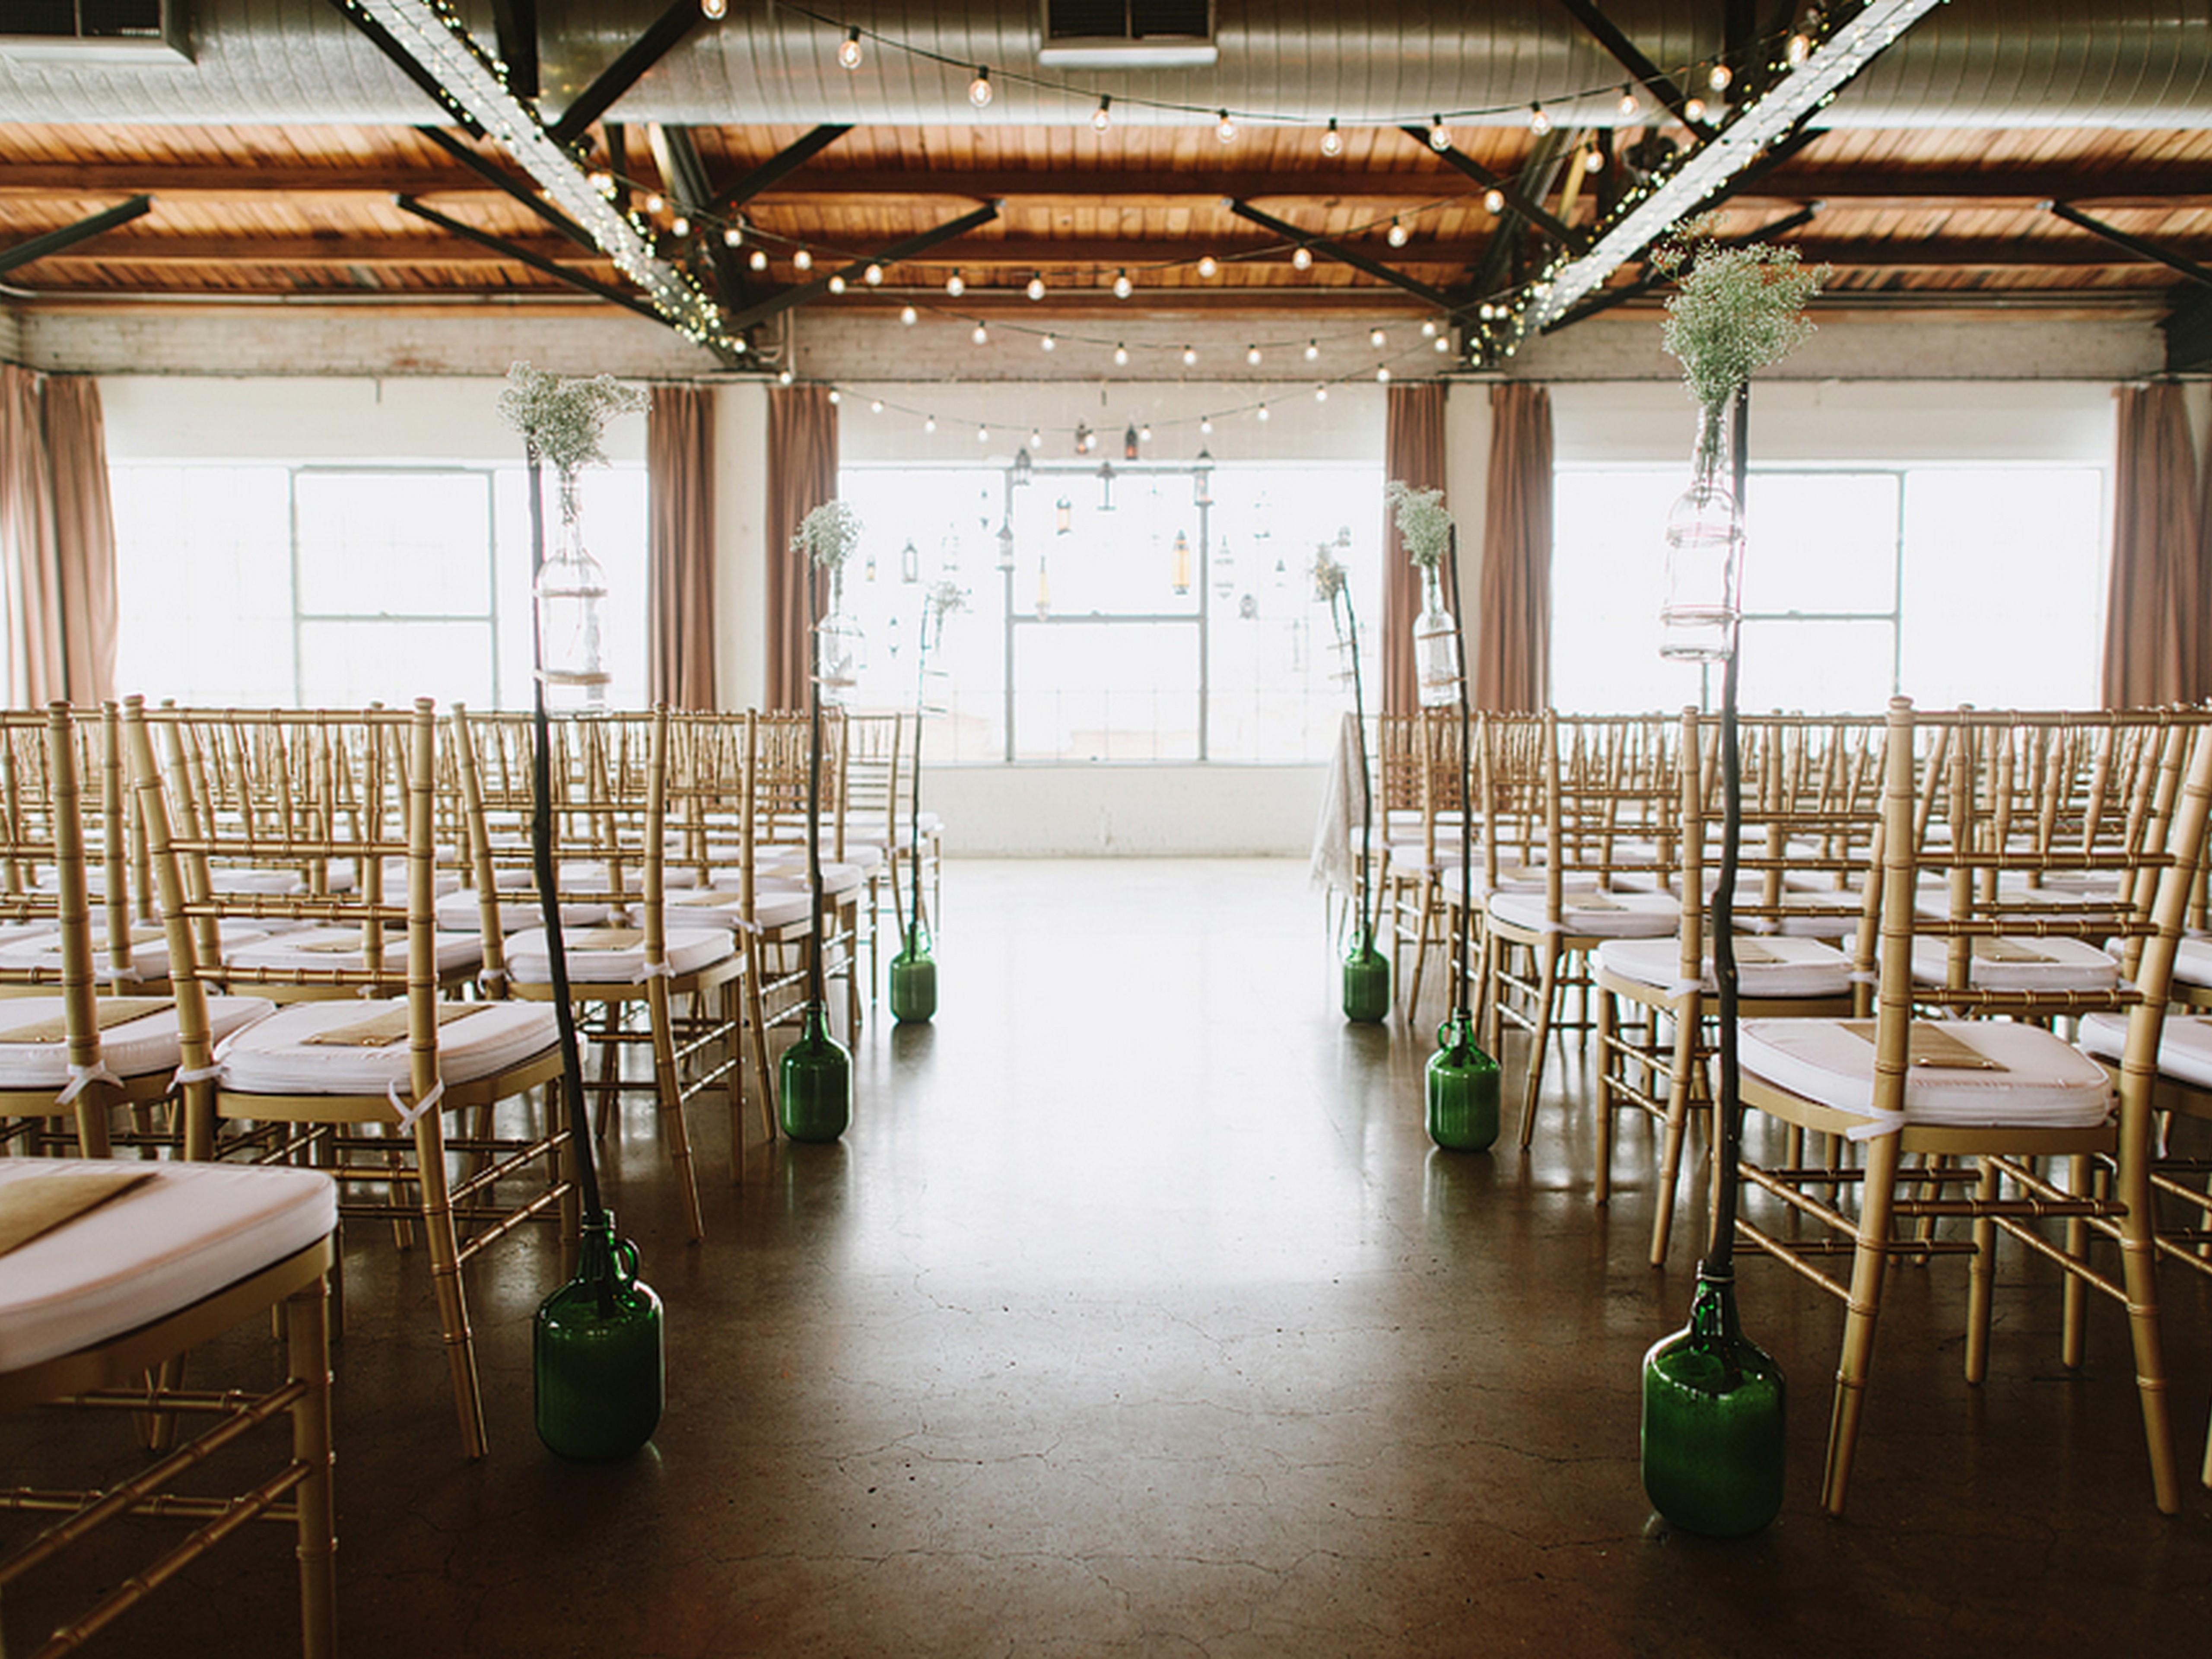 Amber Matt S Farm To Table Wedding At Hickory Street